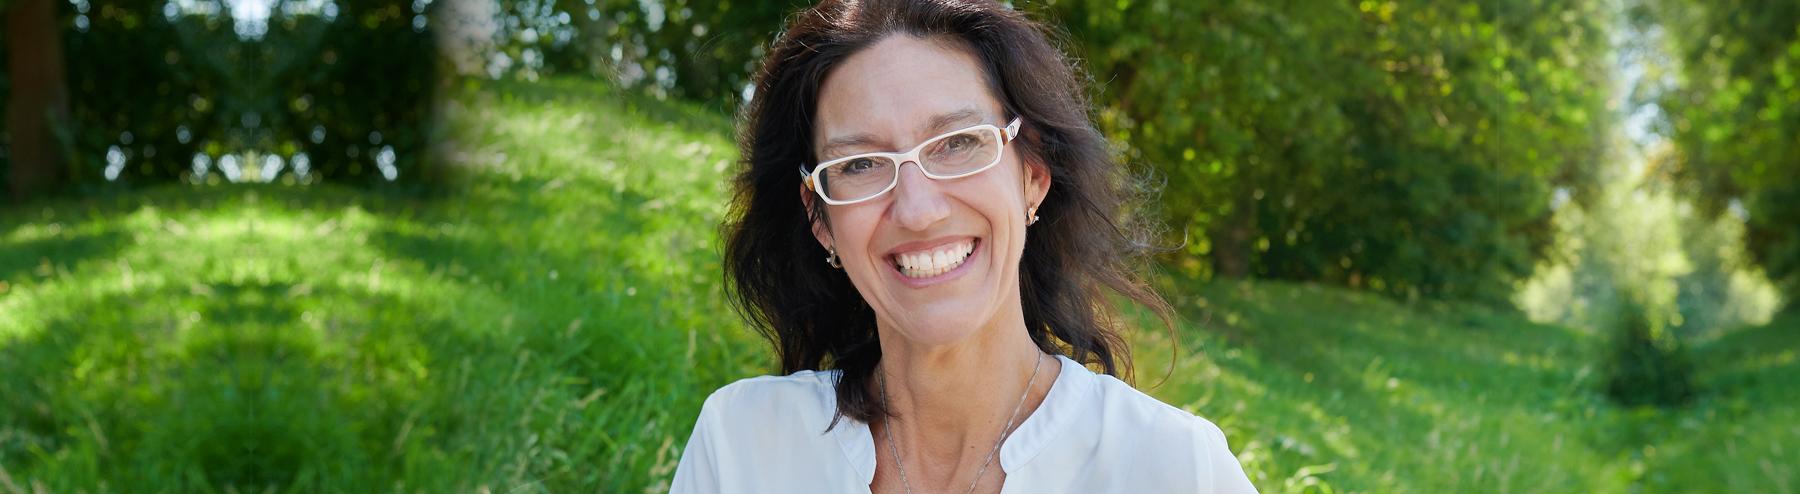 Andrea Ziegler - Diplom Betriebswirtin (FH) - Steuerberater